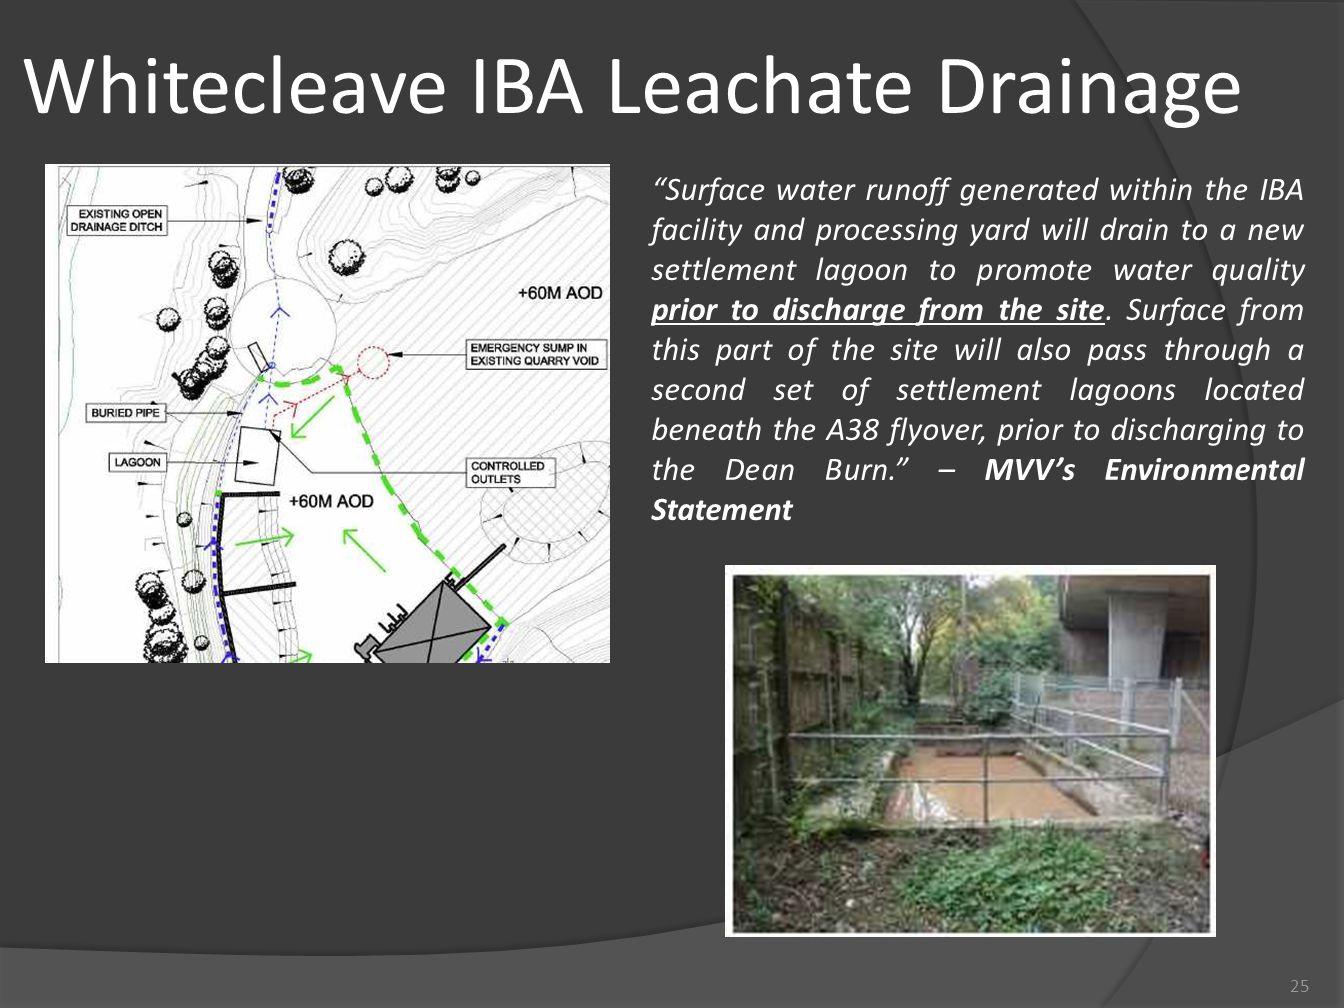 Whitecleave IBA Leachate Drainage